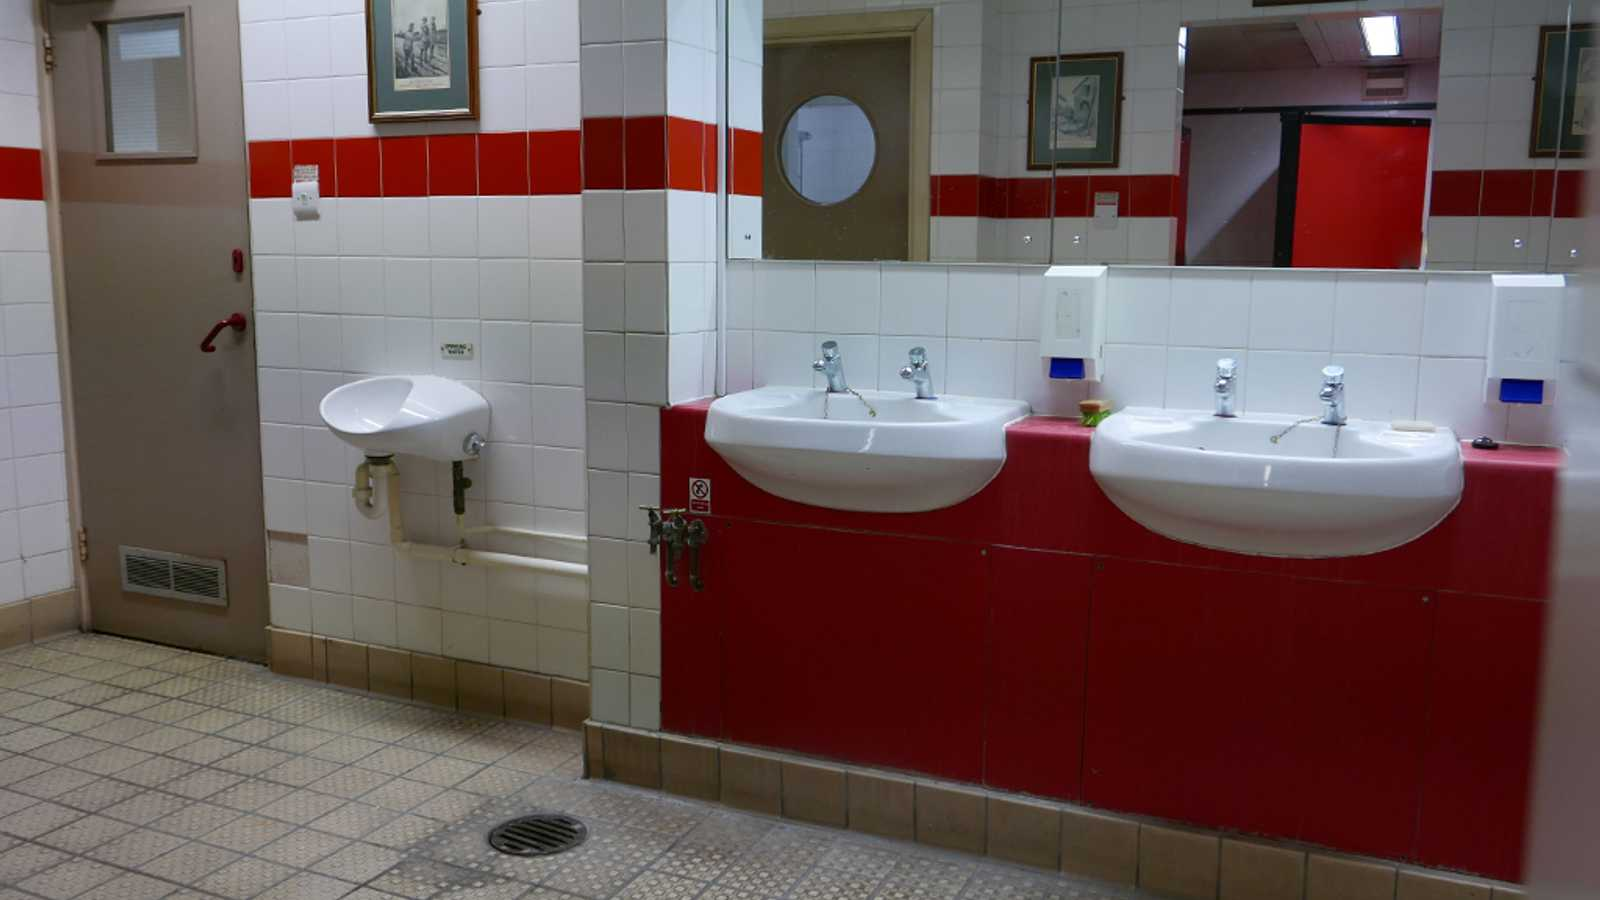 Toilets & Showers